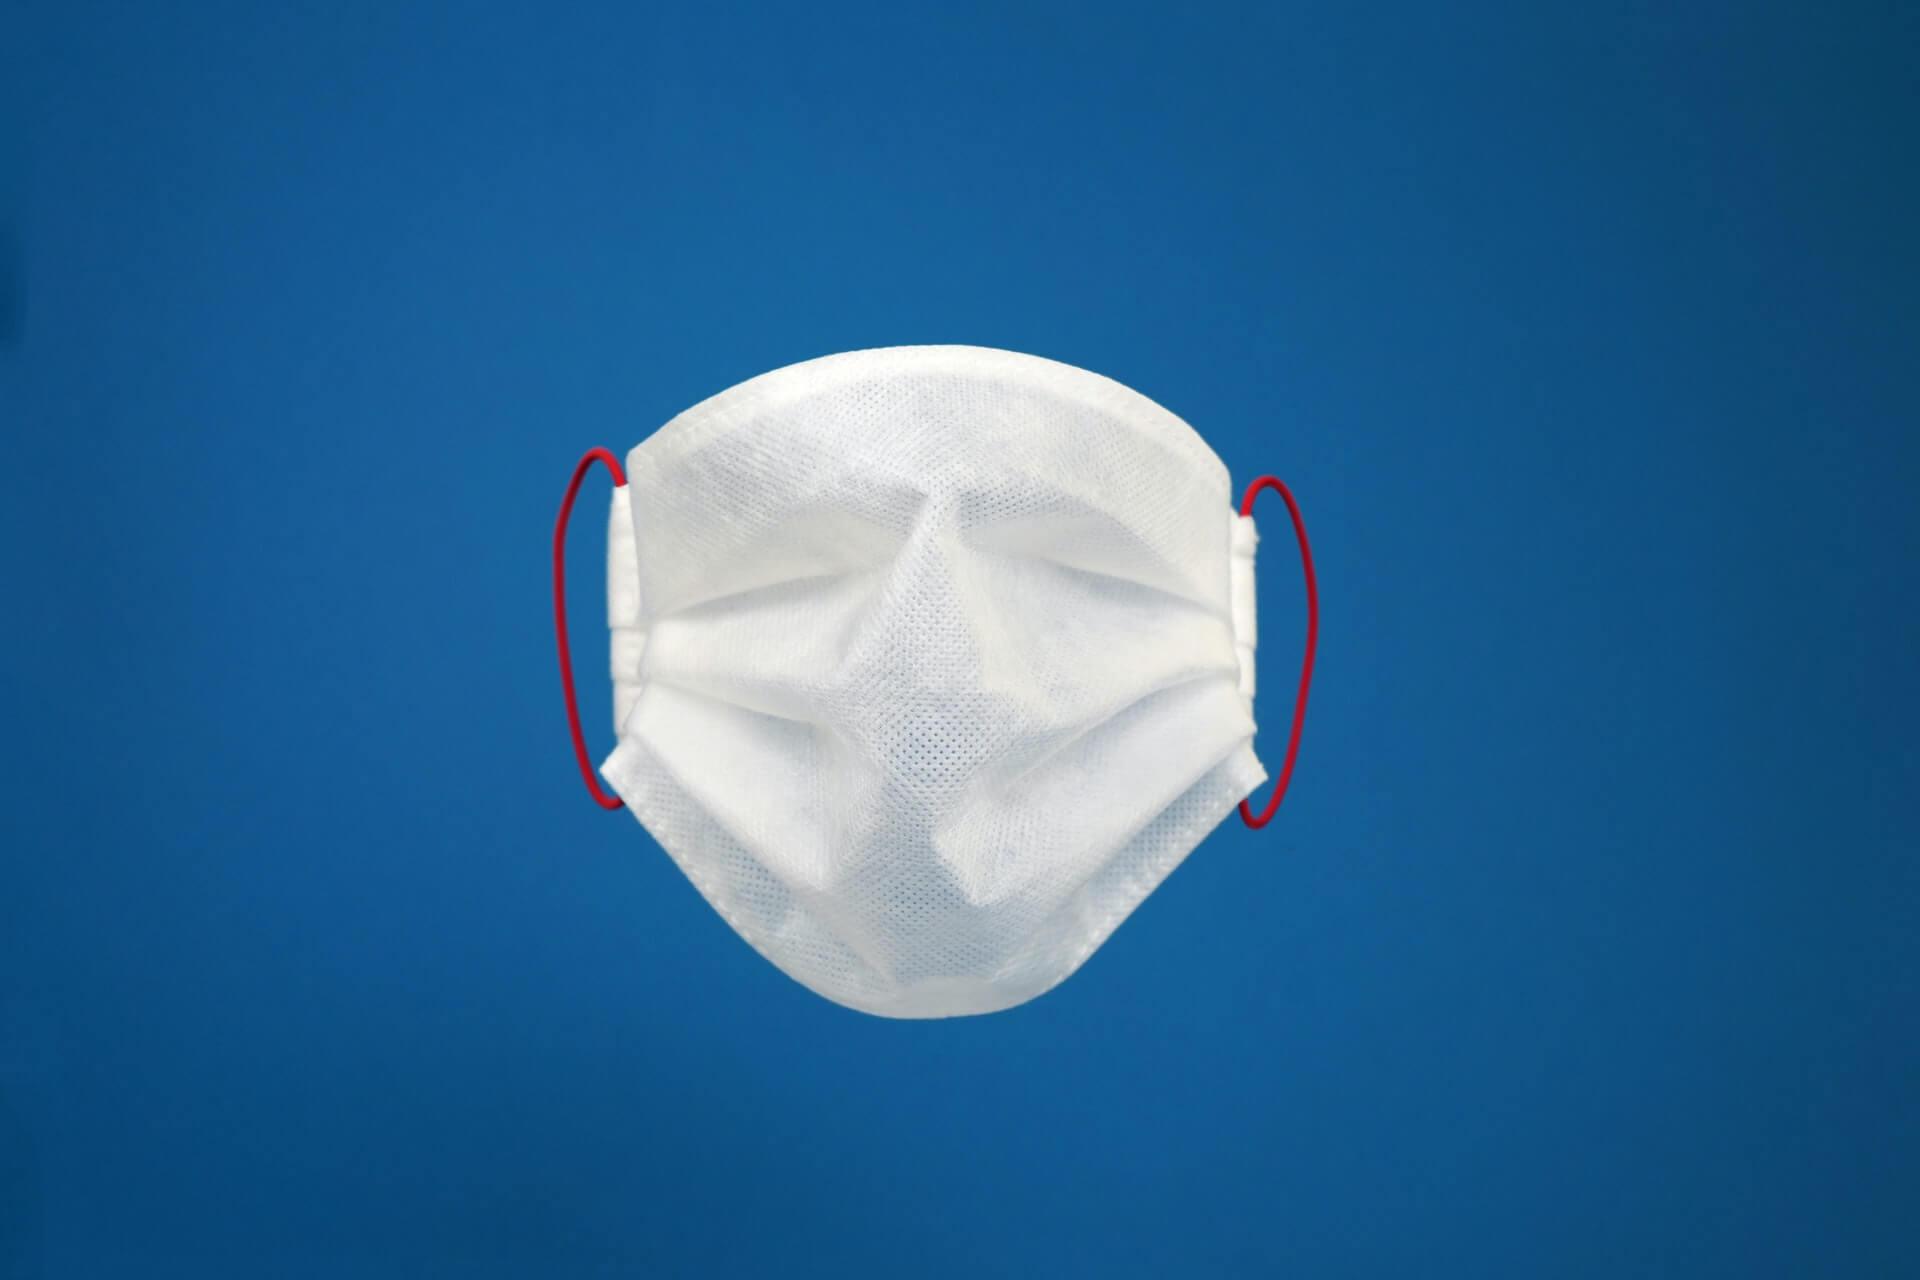 White face mask against blue background